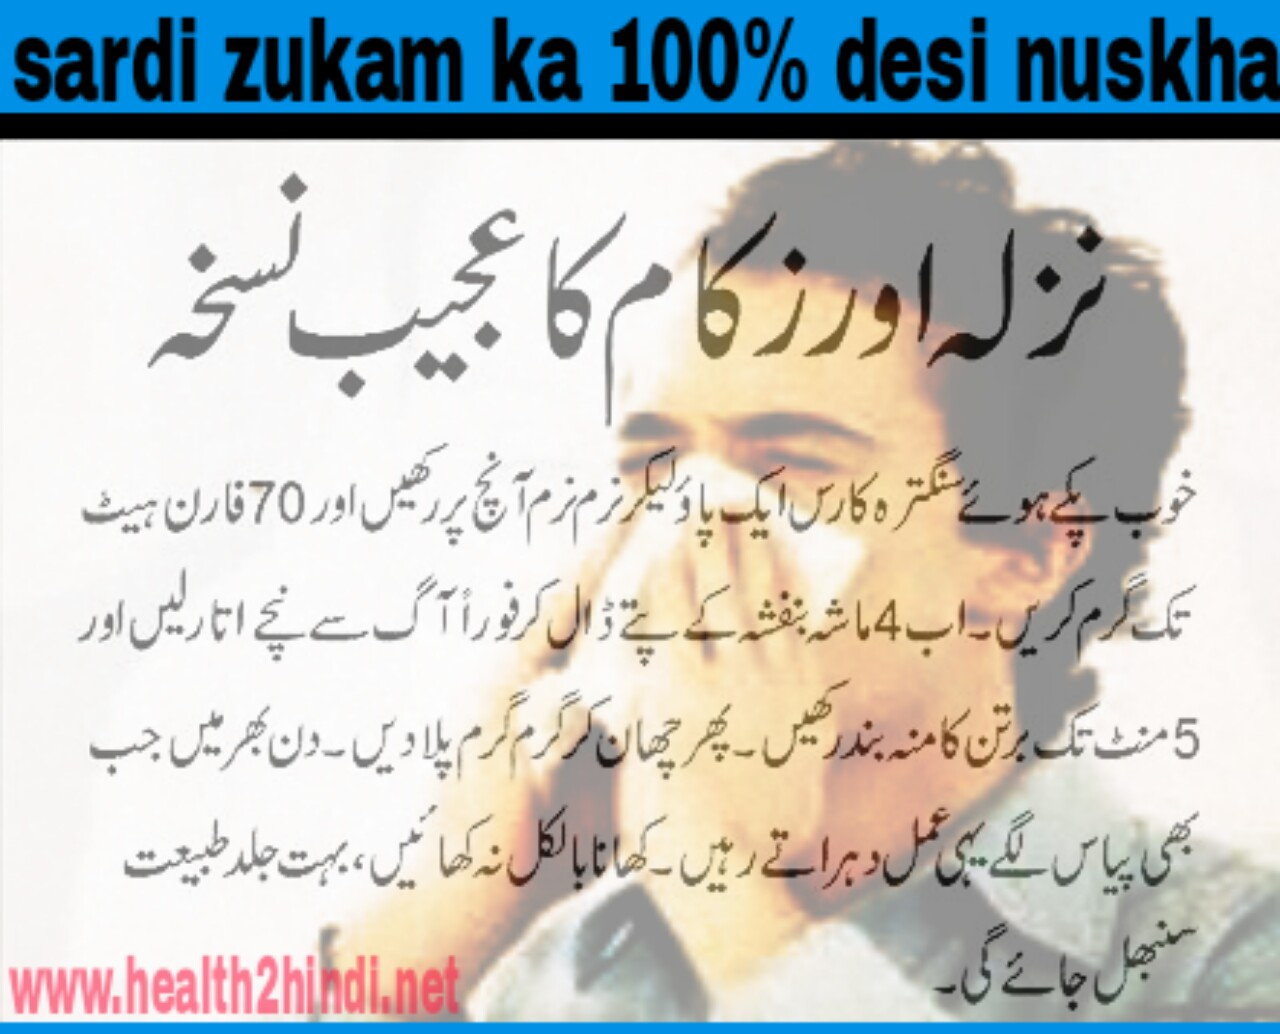 Sardi zukham Ka Desi Ilaj Kaise Kare Home Remedies For Cough